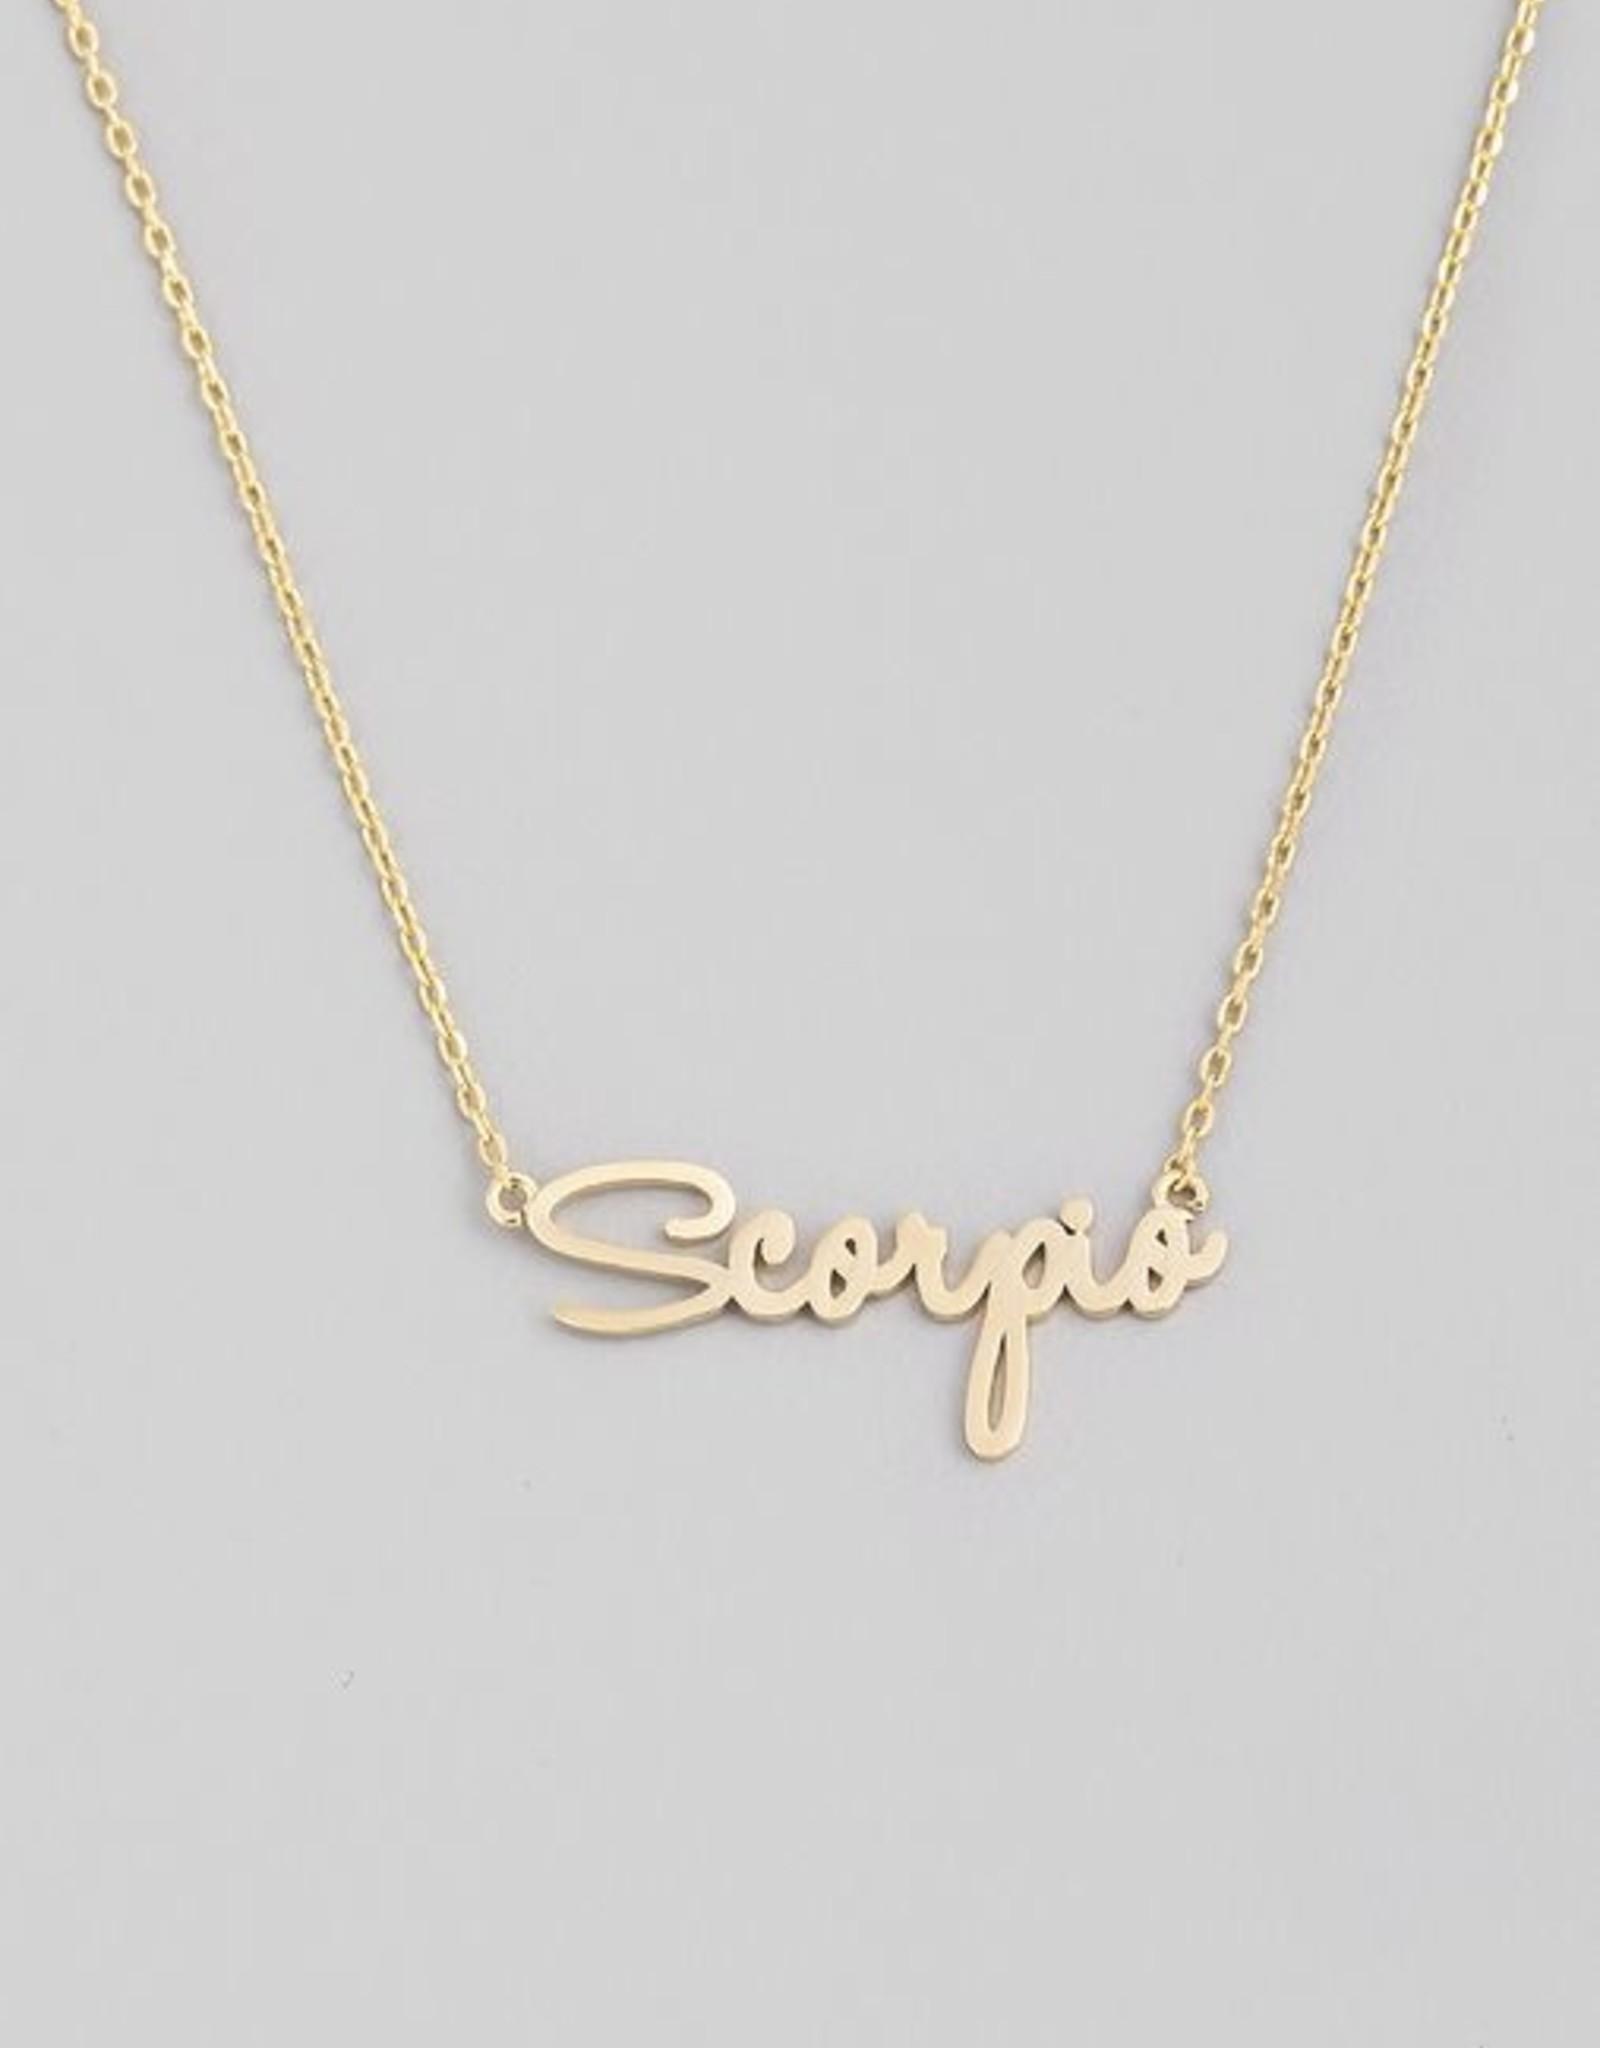 Fame Accessories Handwritten Zodiac Necklace - Scorpio